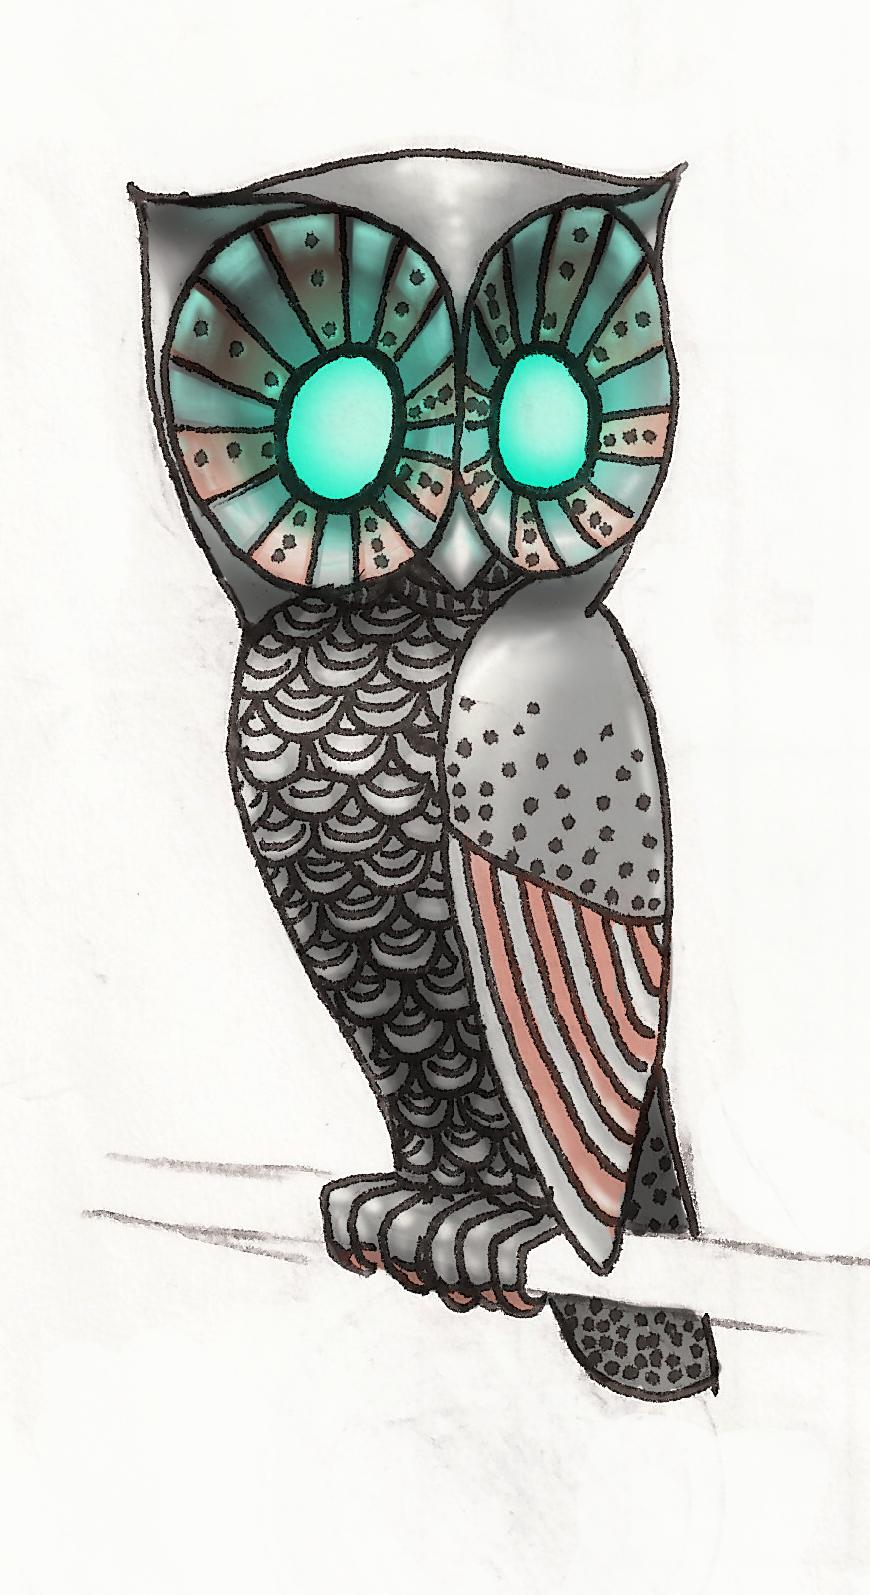 Cool owl drawings - photo#19